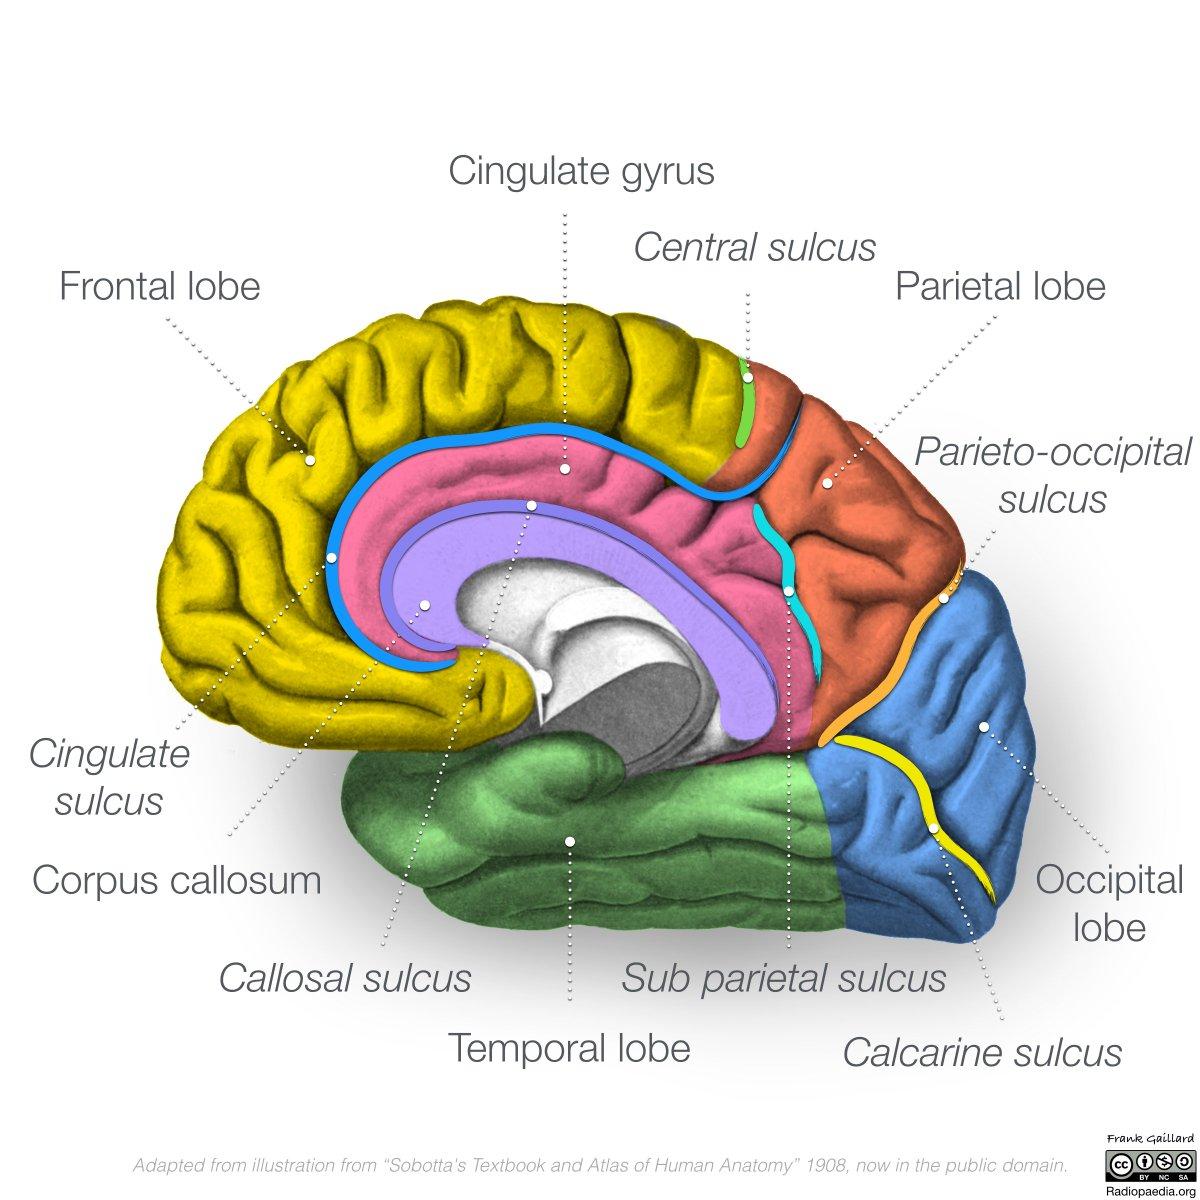 Frank Gaillard On Twitter More Neuro Anatomy Diagrams Now